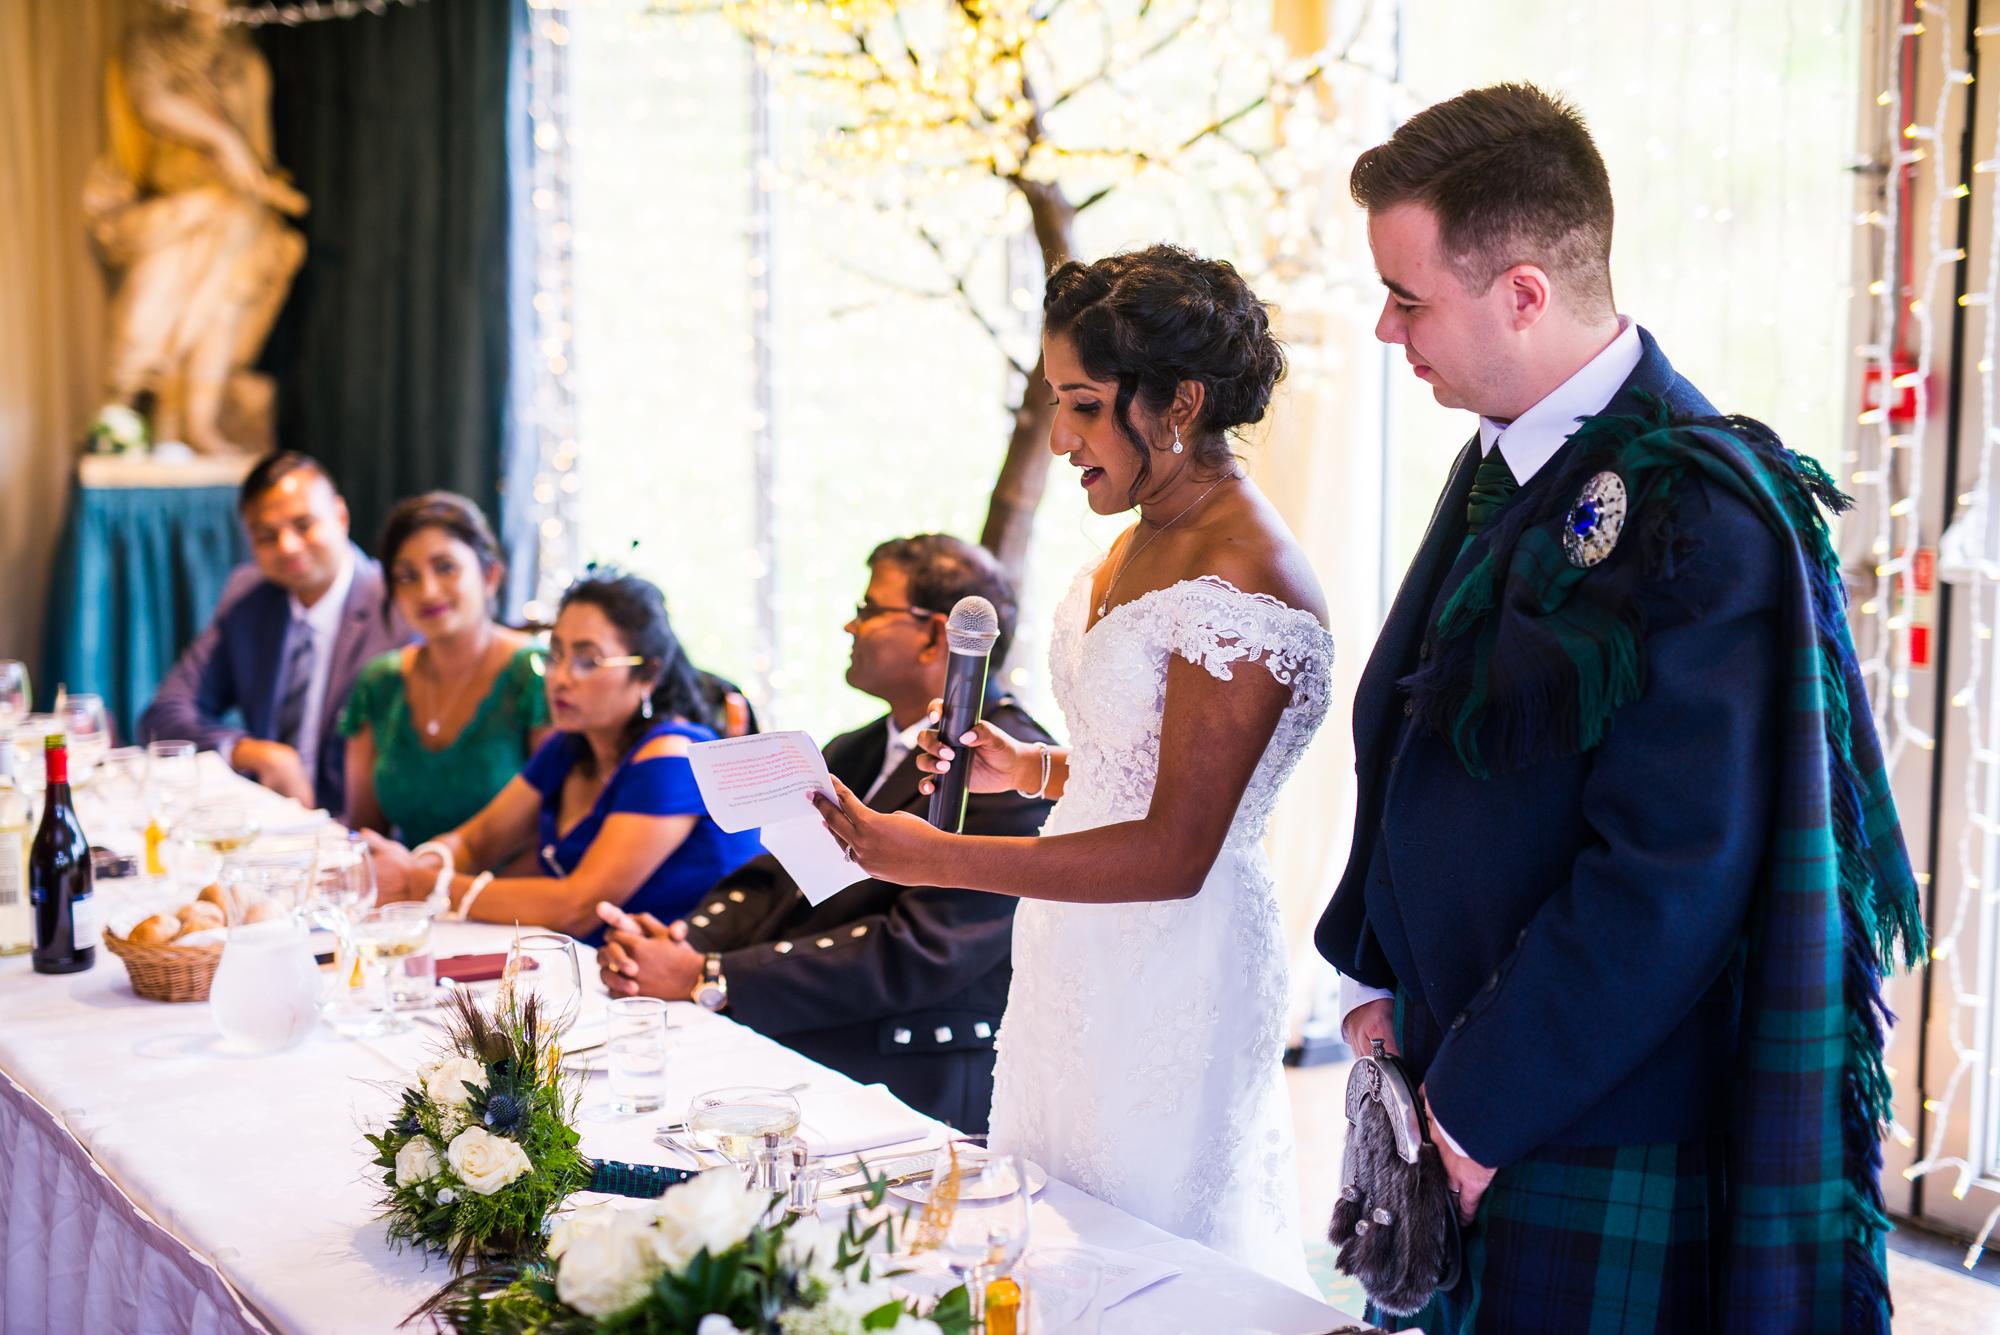 Kev and Shrabani wedding photos (256 of 350).jpg